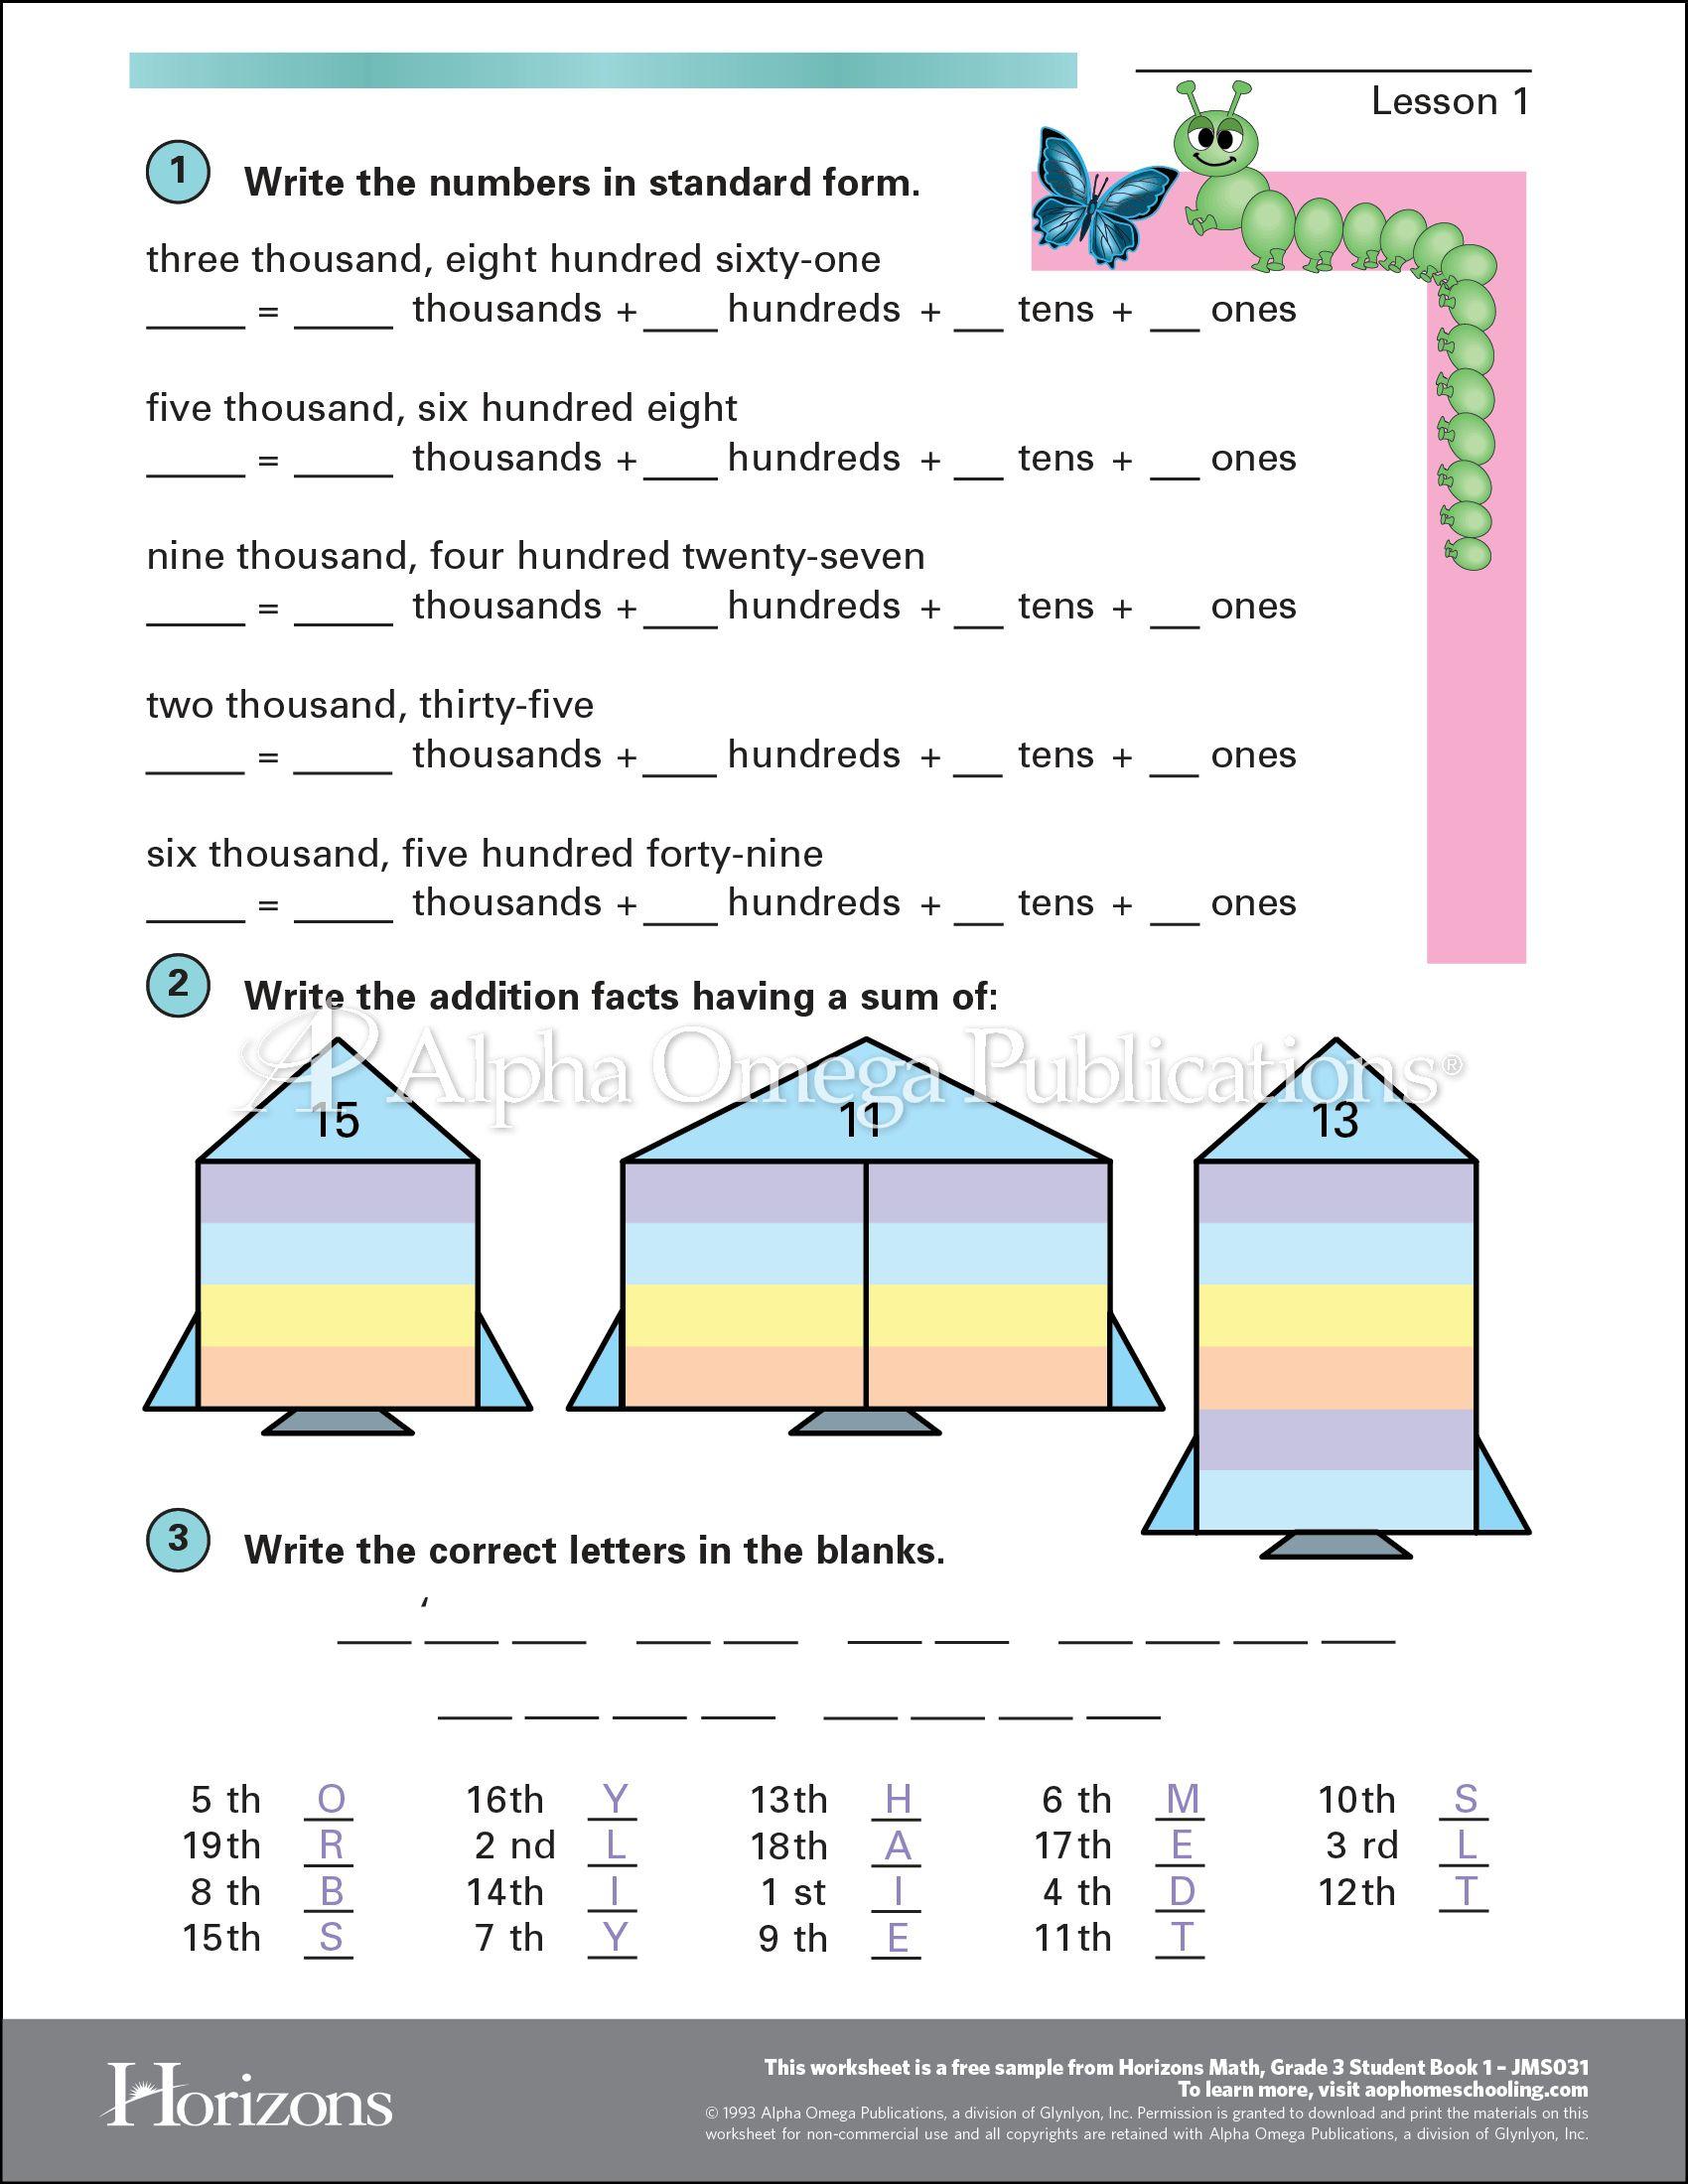 worksheets homeschool curriculum free worksheets opossumsoft worksheets and printables. Black Bedroom Furniture Sets. Home Design Ideas